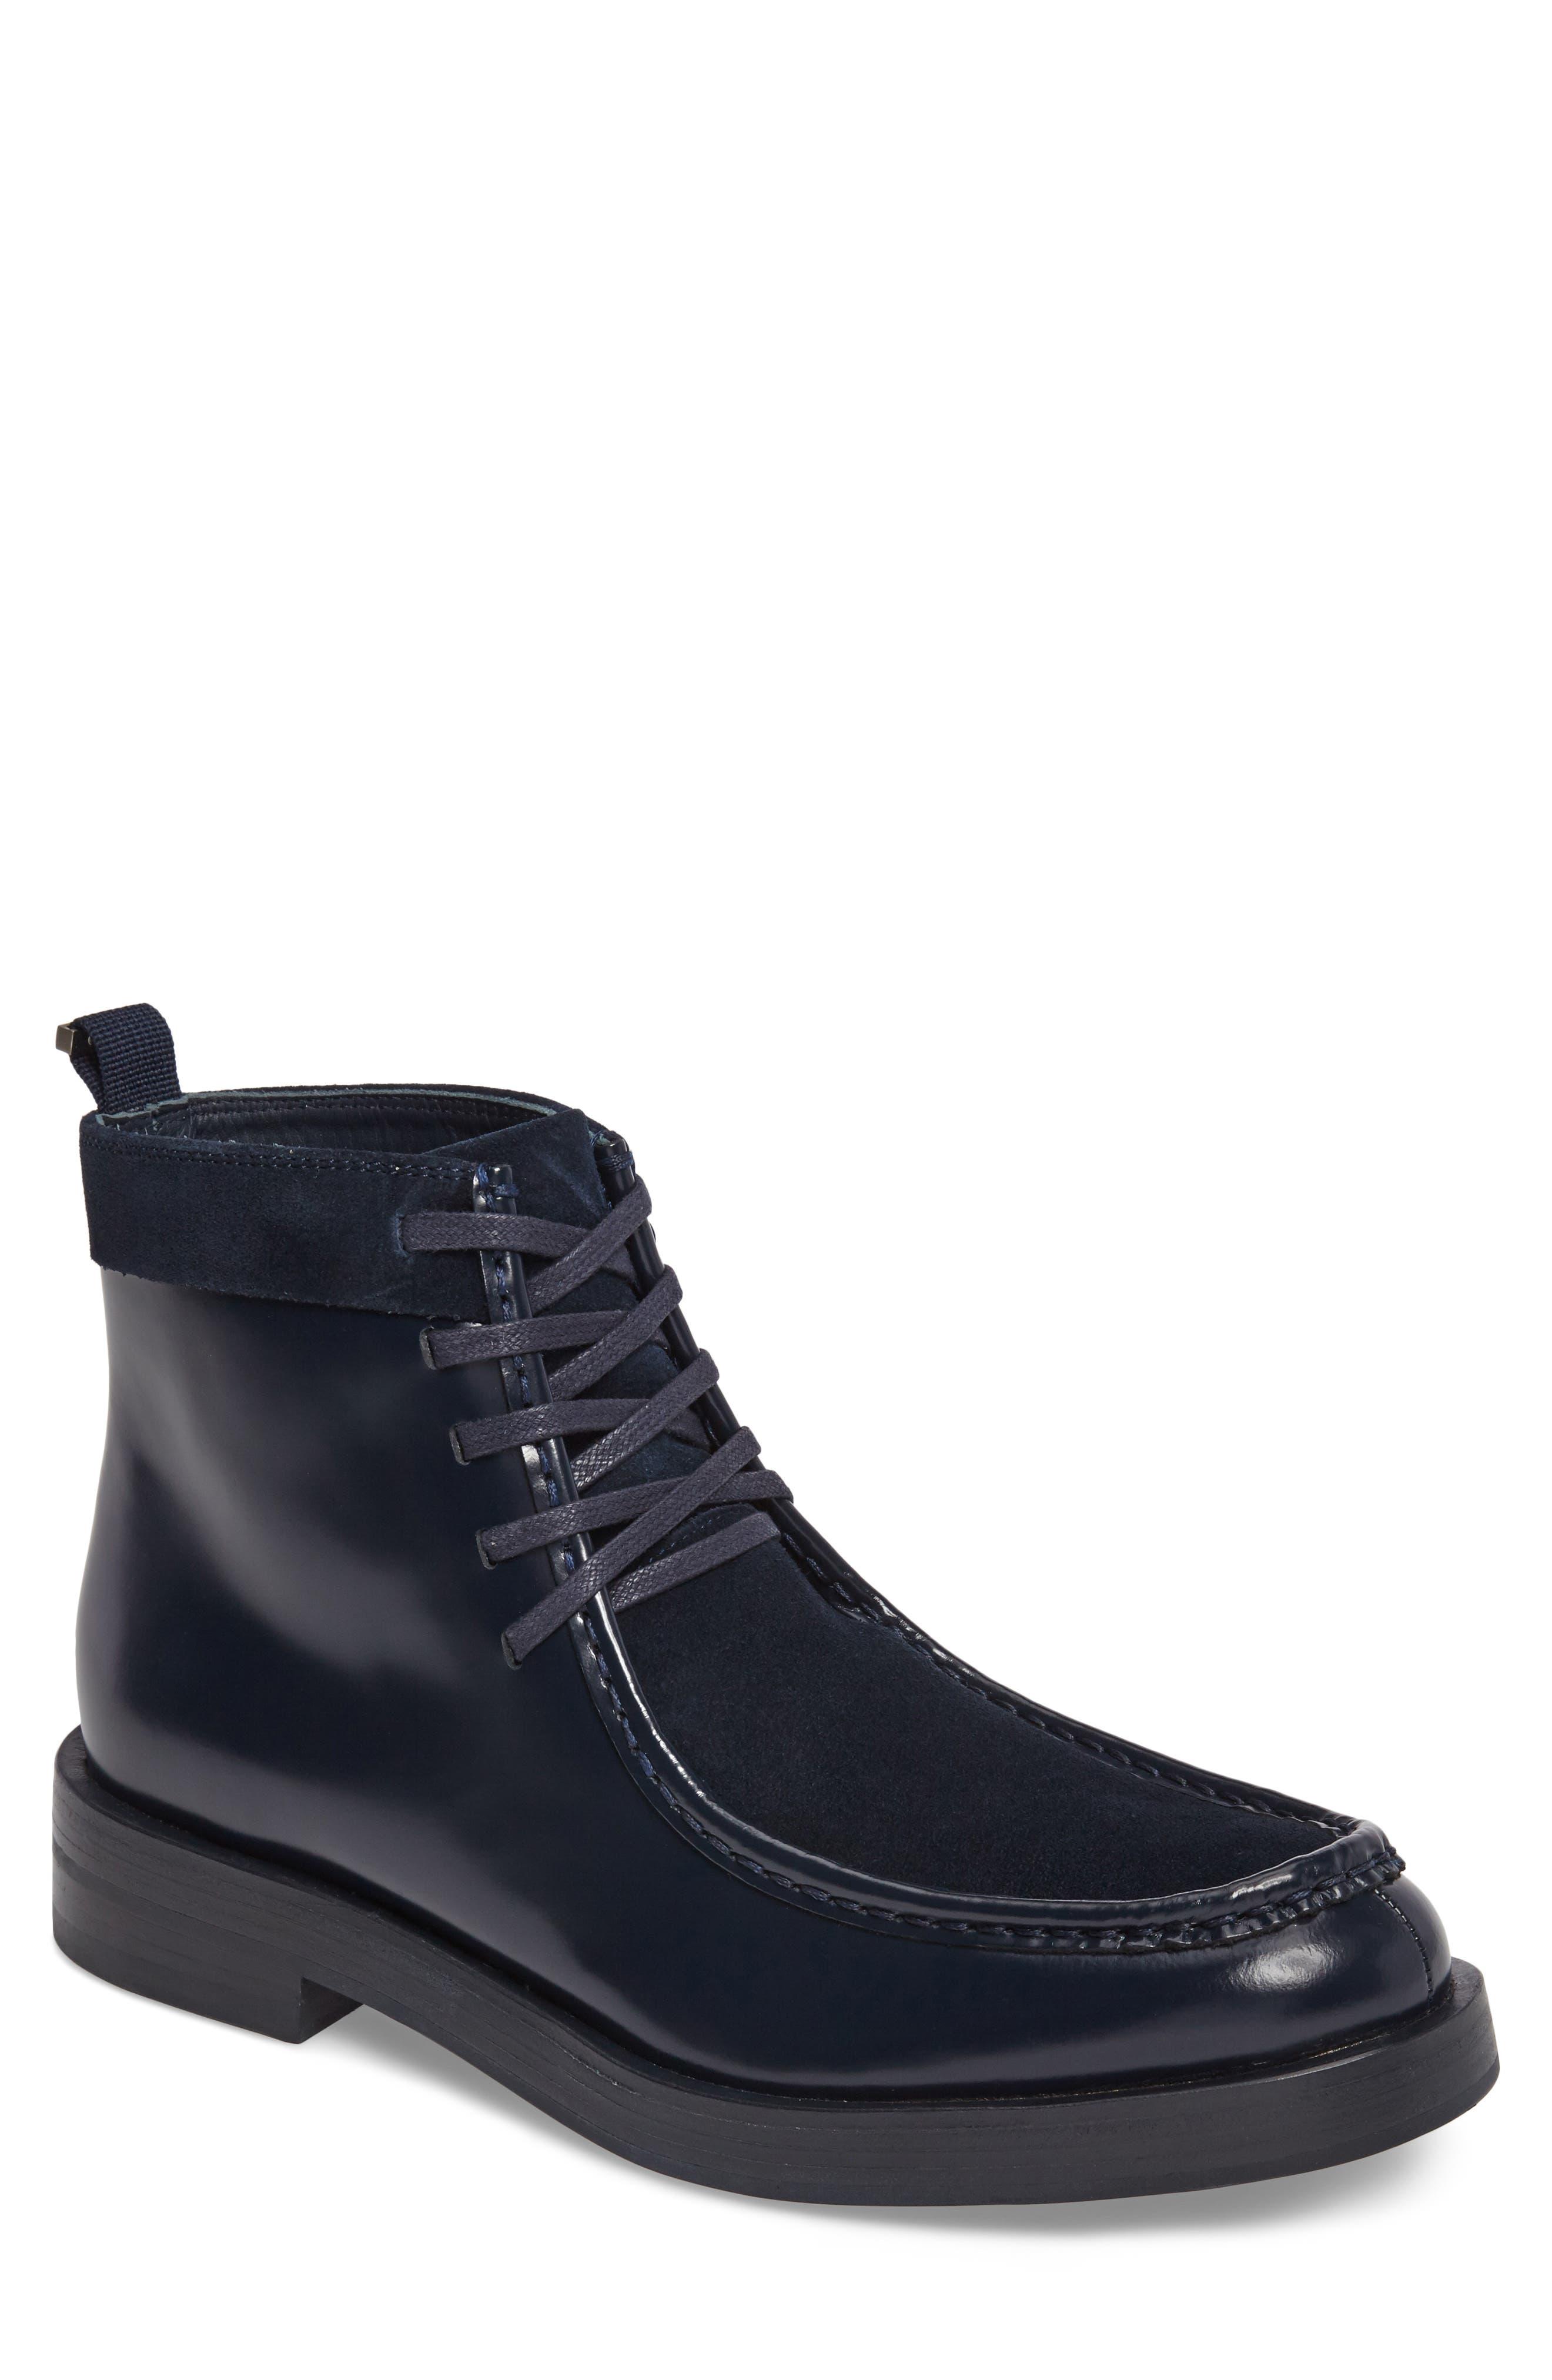 Alternate Image 1 Selected - Calvin Klein Rafi Moc Toe Boot (Men)